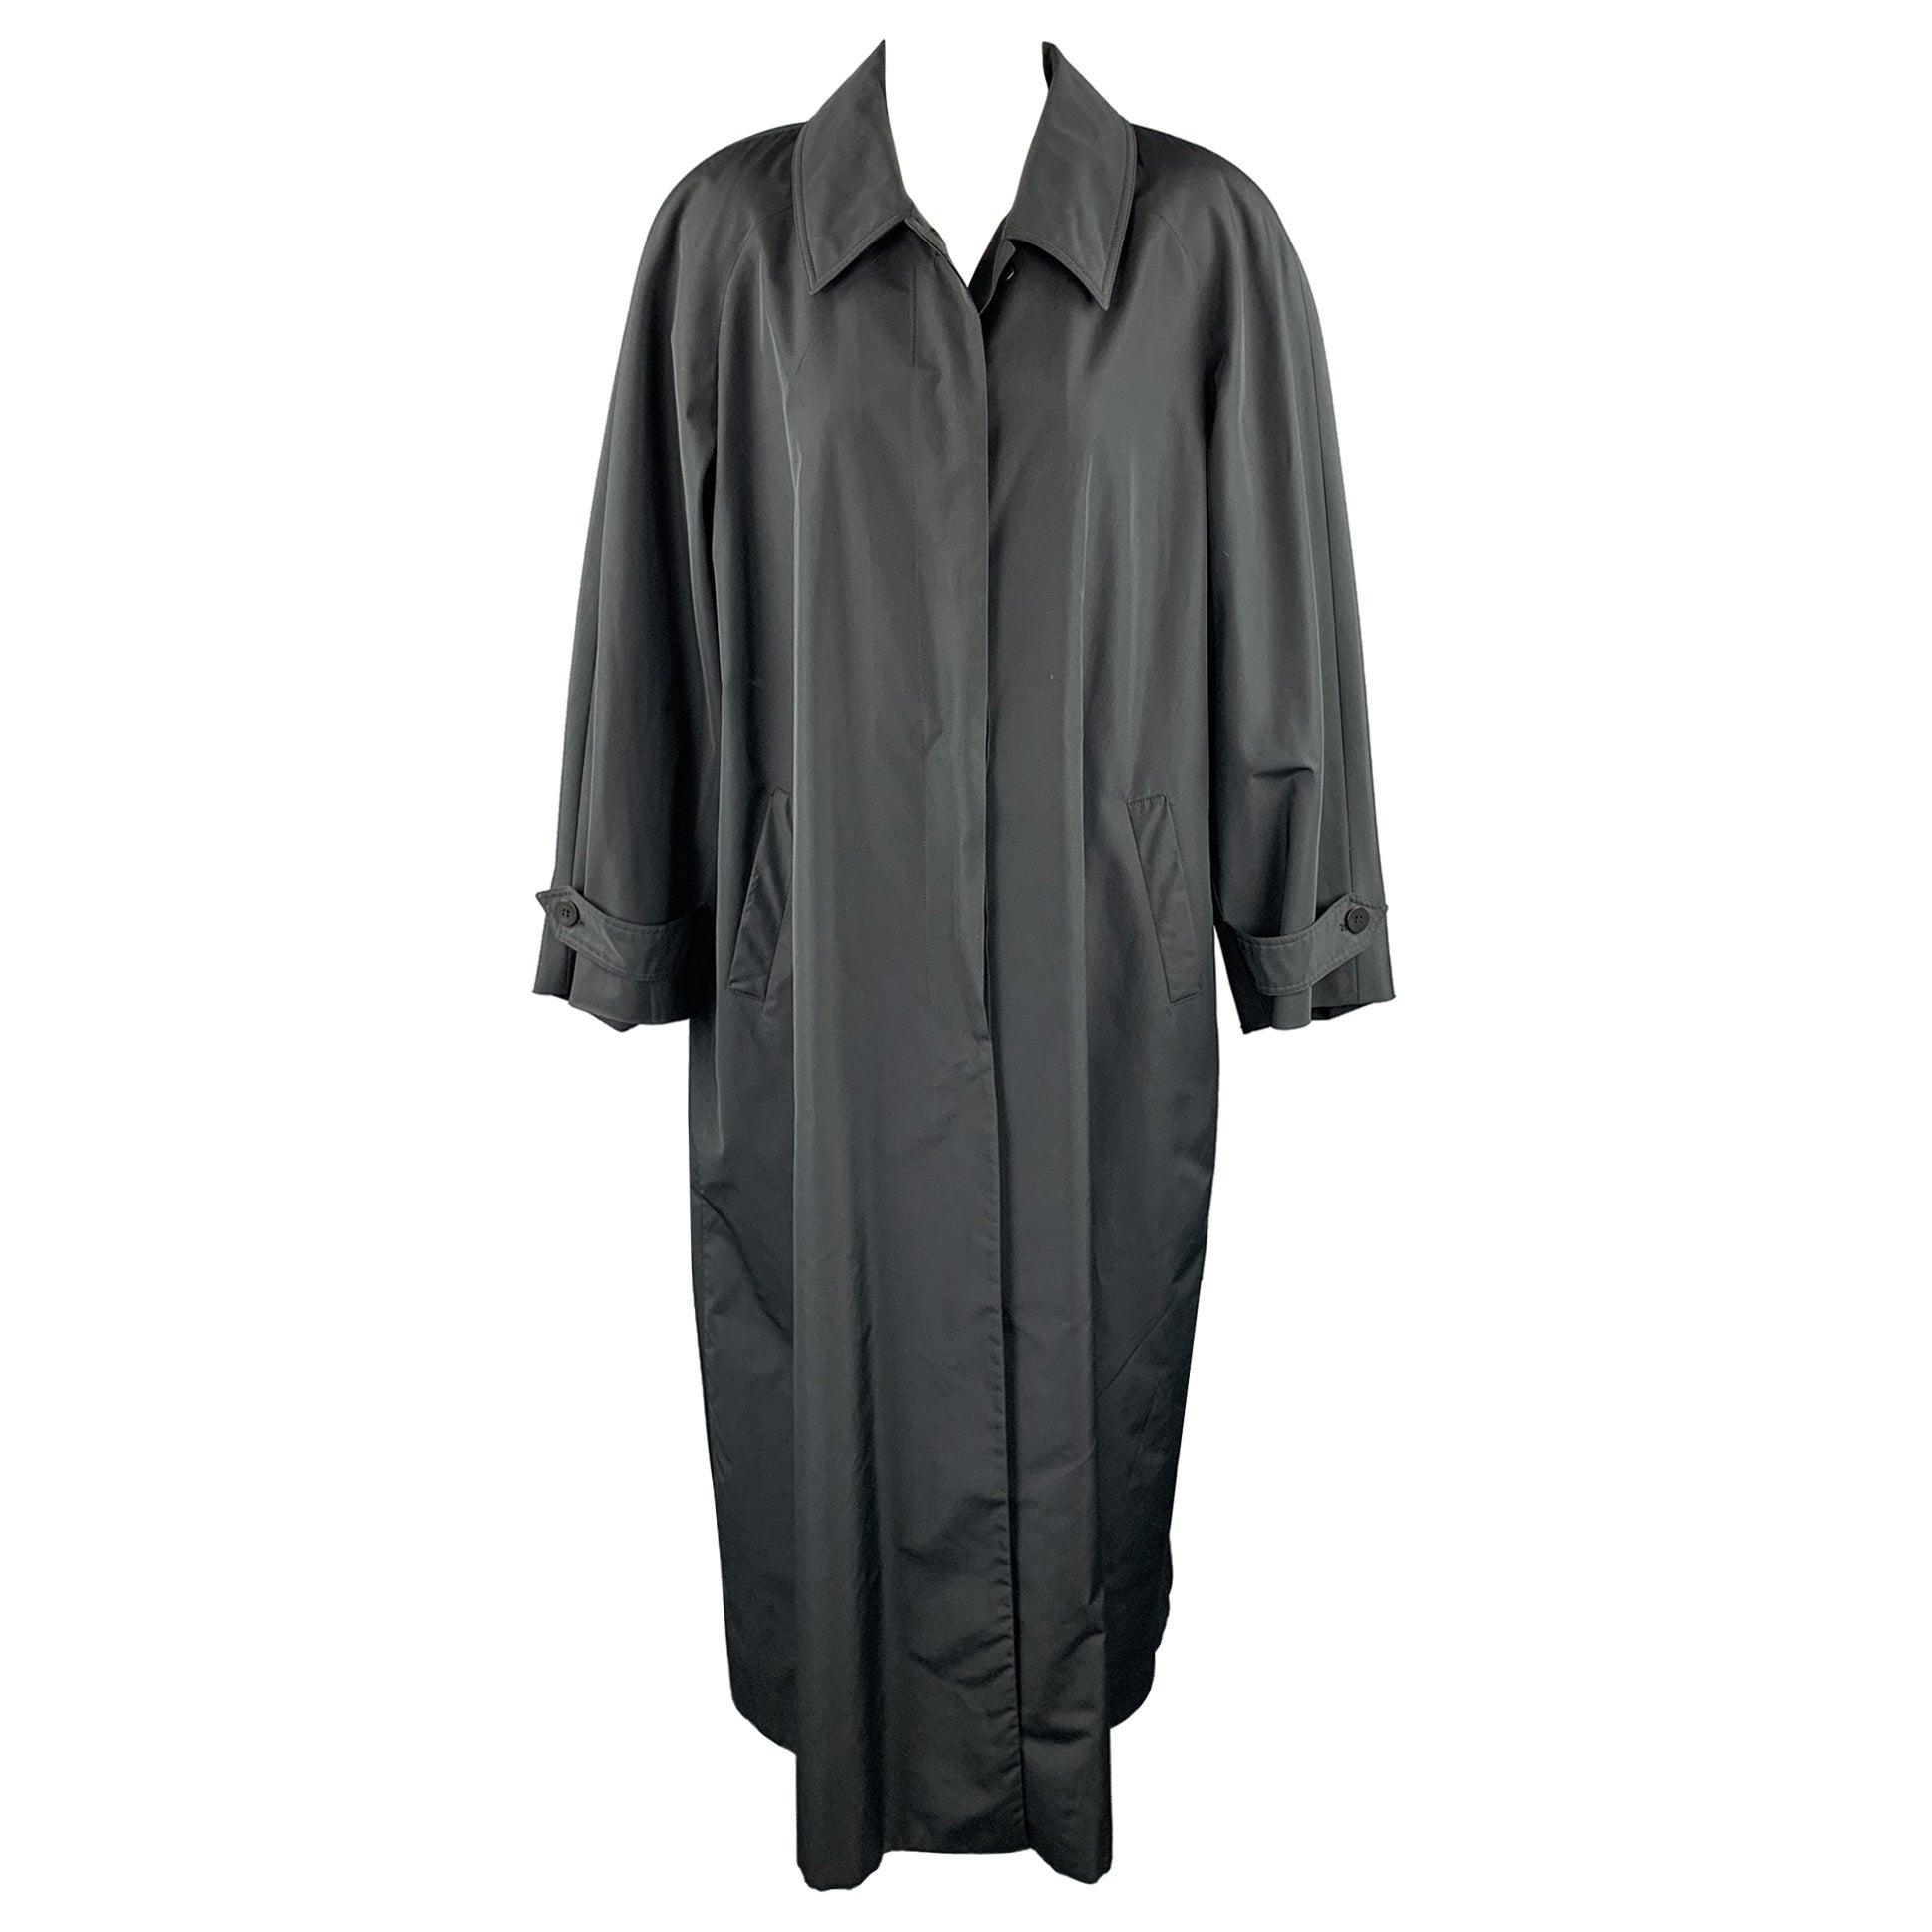 JOAN & DAVID Size 8 Black Polyester / Silk Long Coat